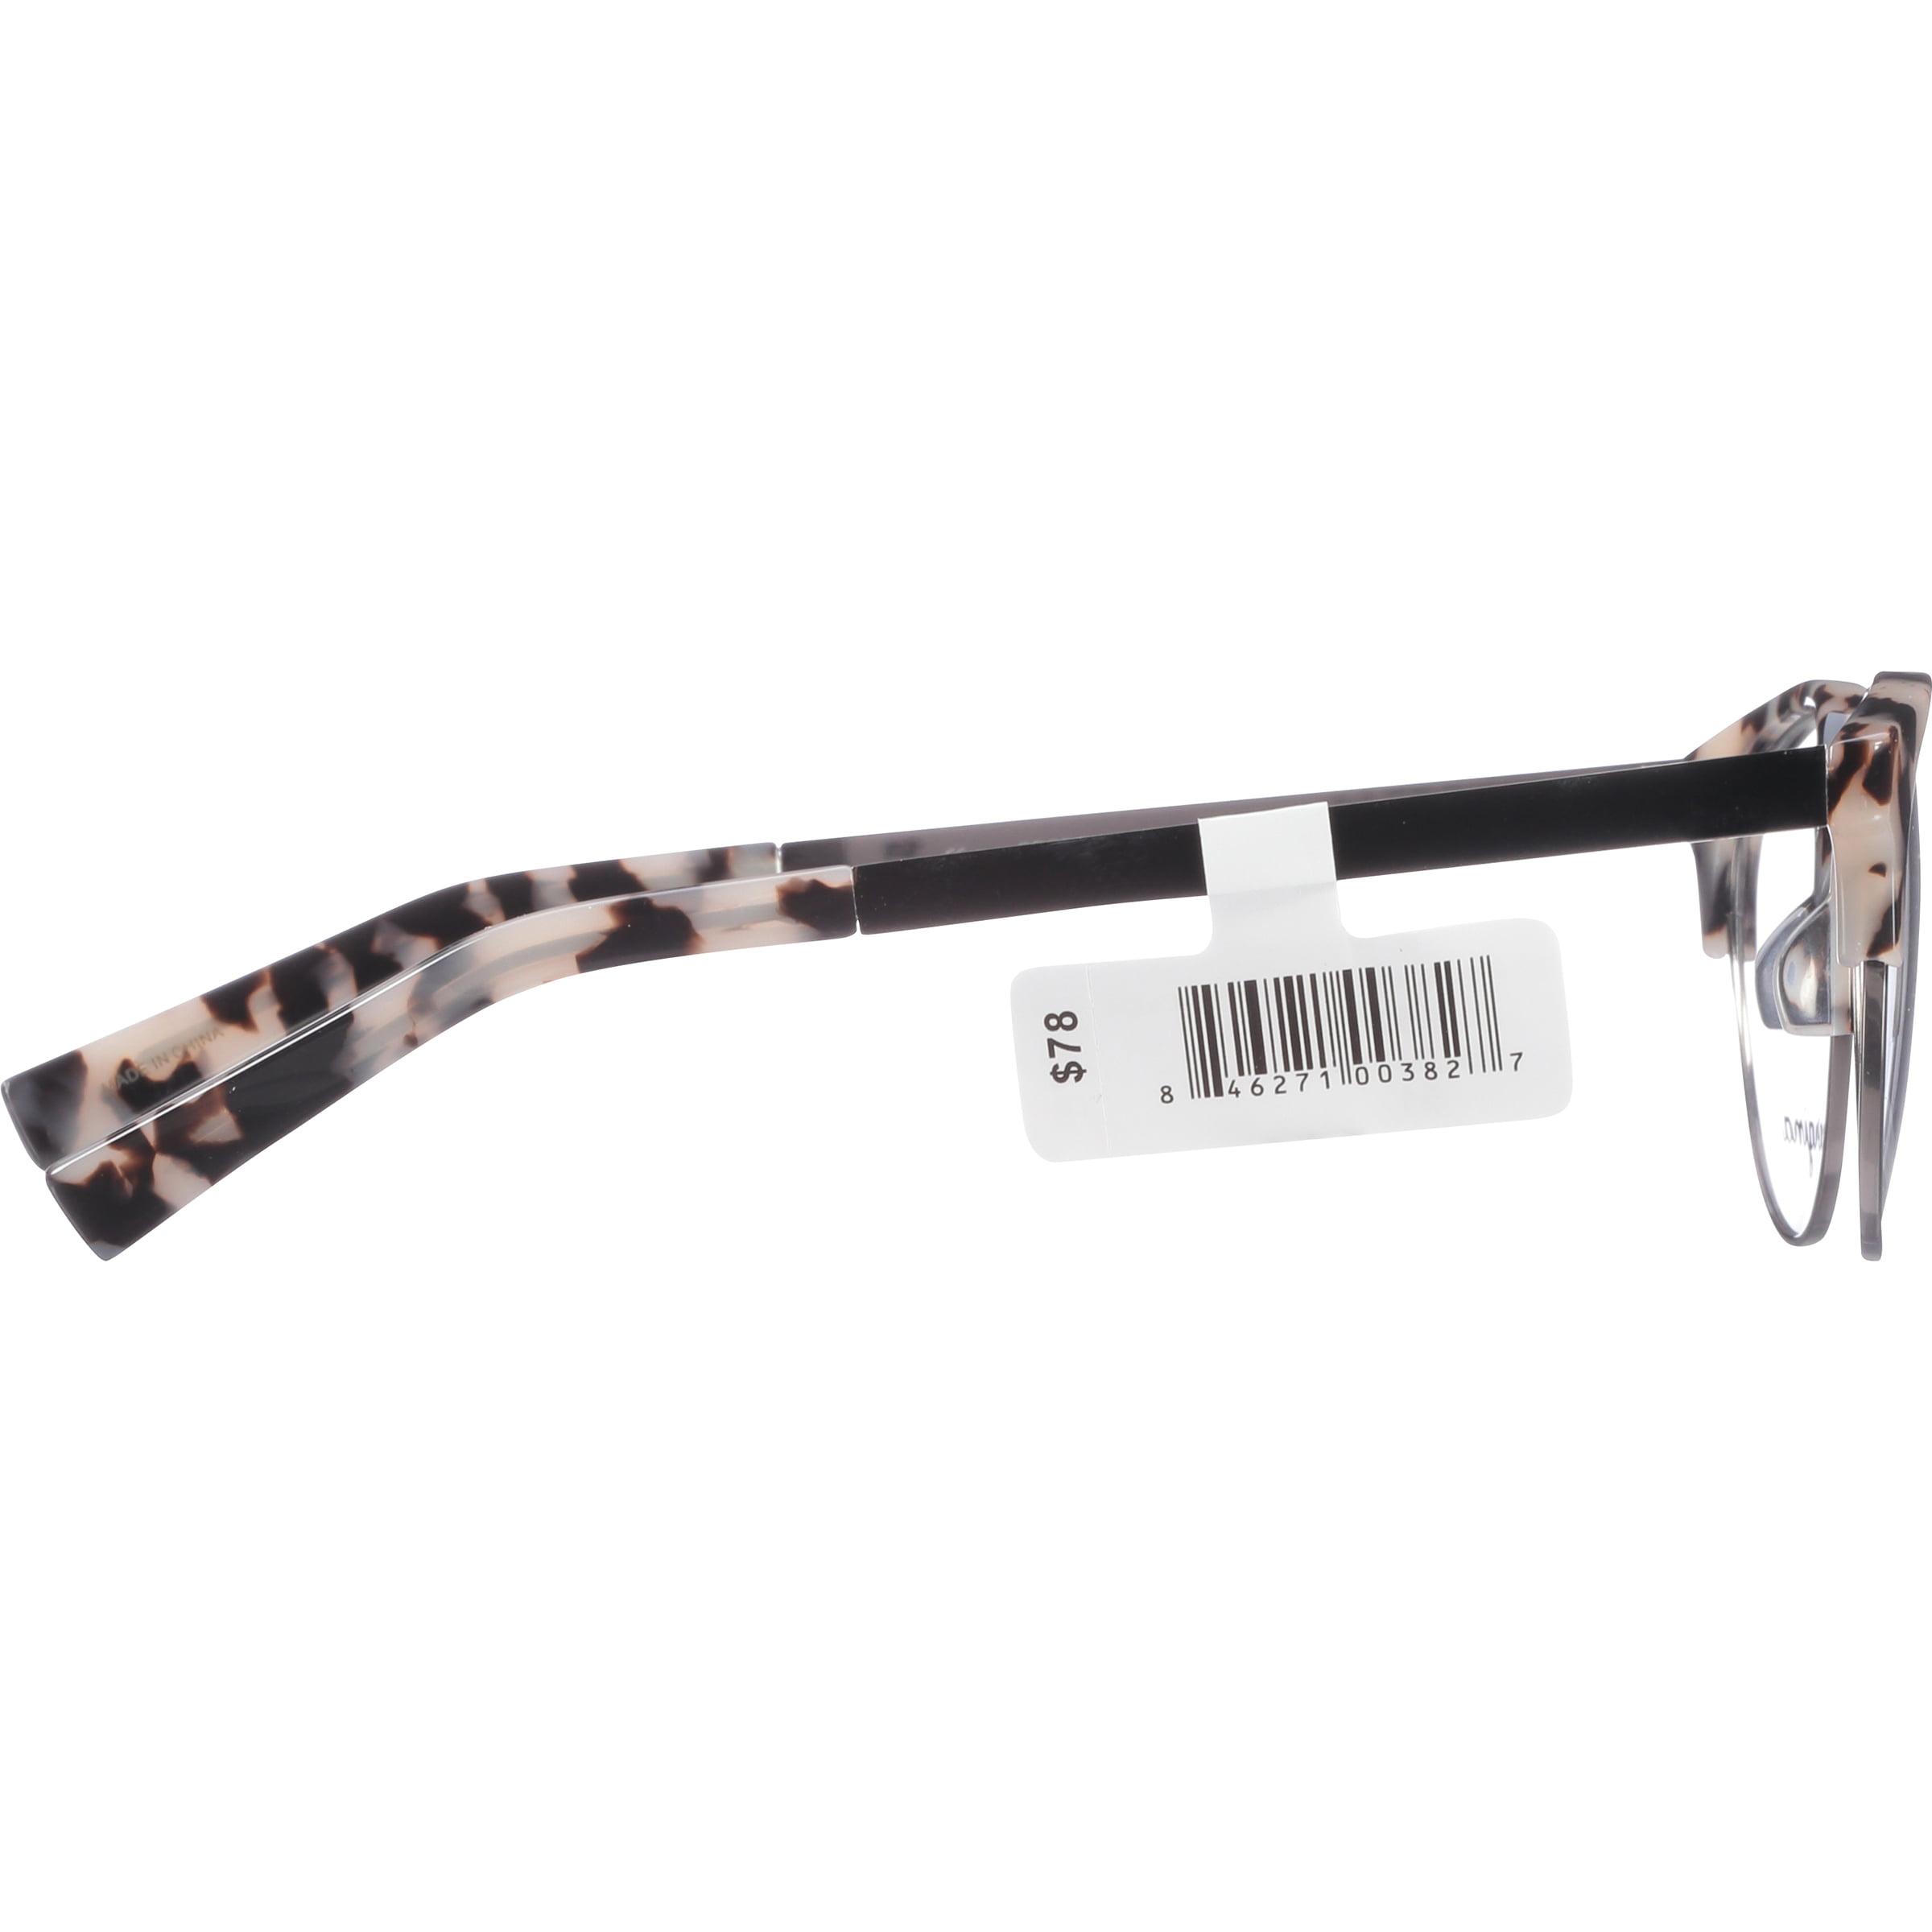 Georgina Eyewear Rx-able Eyeglass Frames 705 Gun Tortoise - Walmart.com